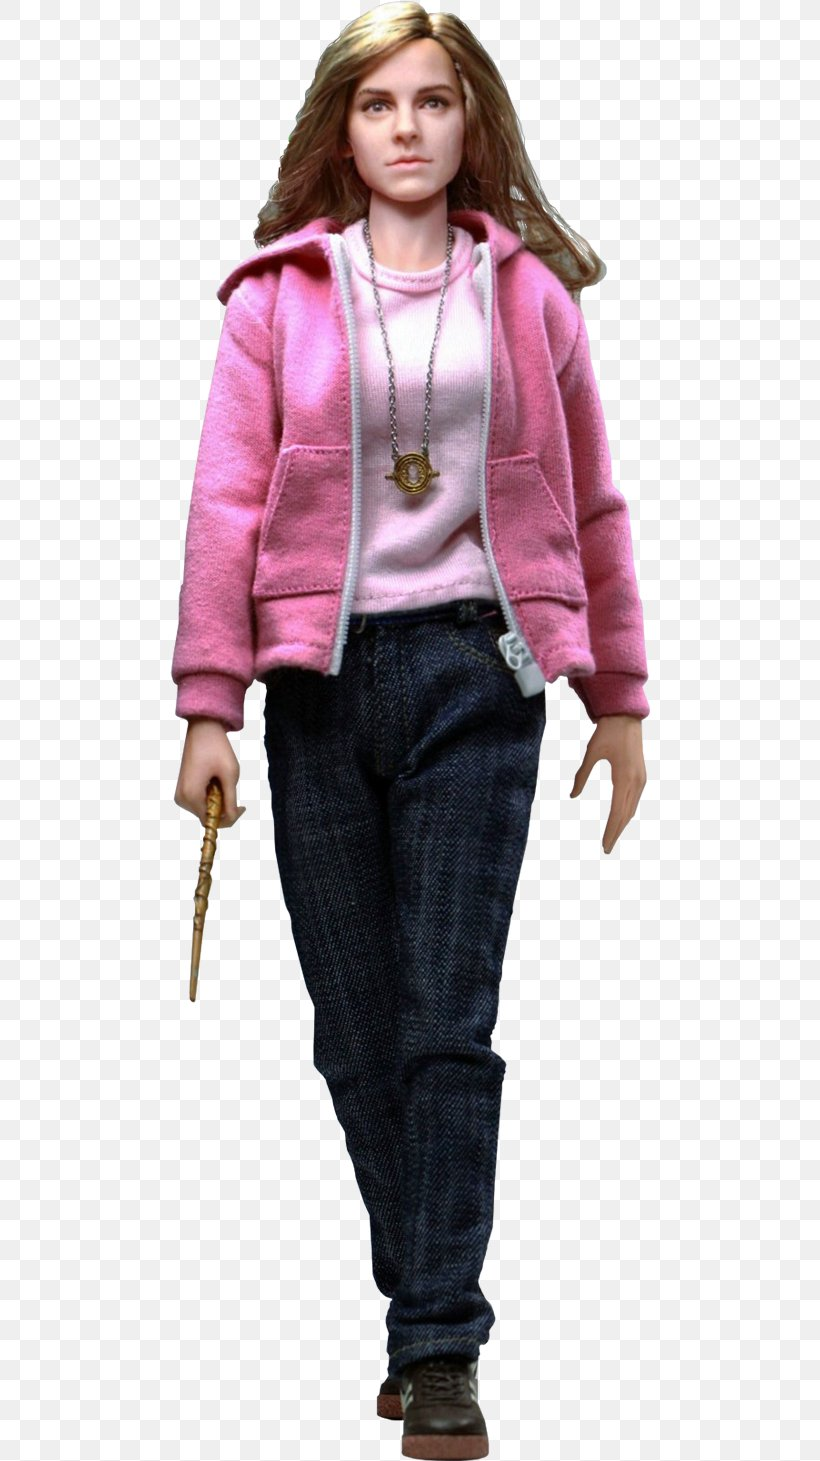 barbie harry potter